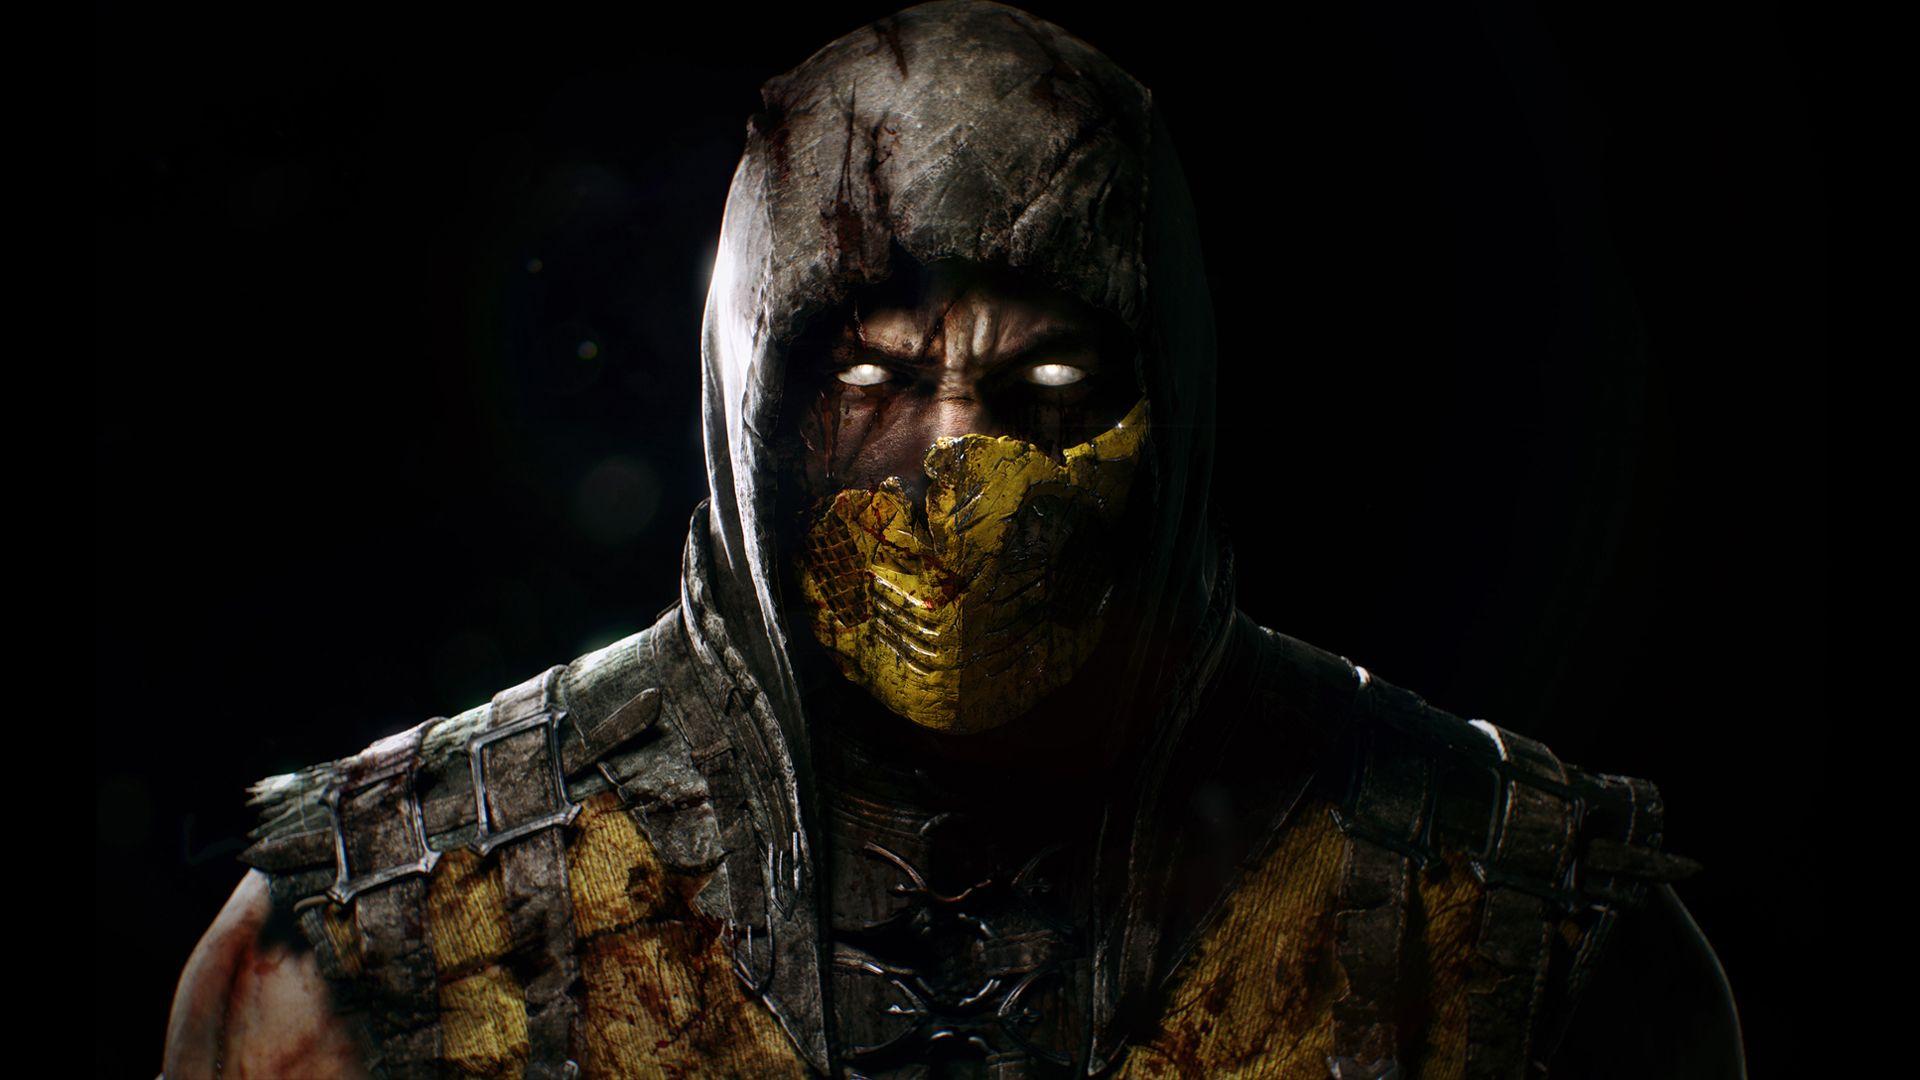 Scorpion Mortal Kombat X Wallpaper Hd Imashon Com Scorpion Mortal Kombat Mortal Kombat X Mortal Kombat X Wallpapers